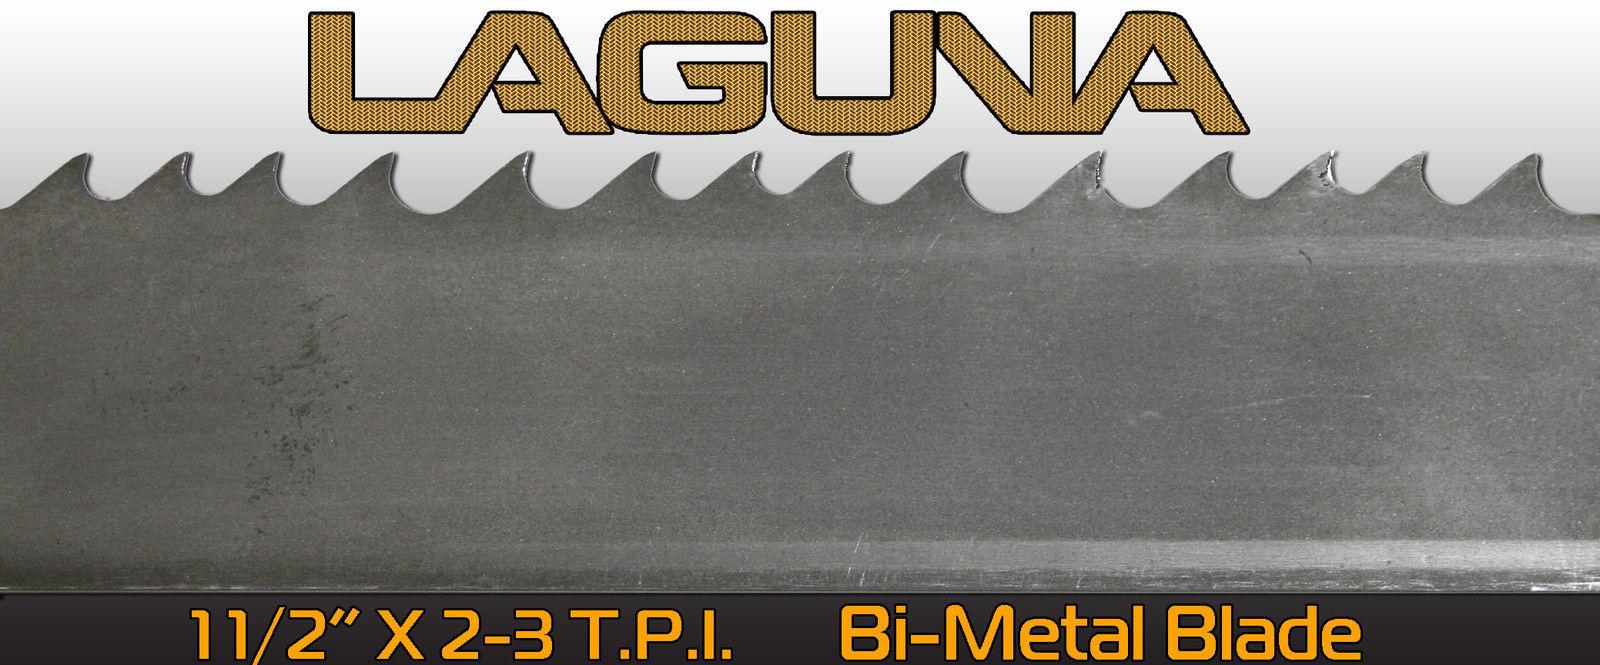 "1 1/2"" 2-3 TPI X 123"" Bimetal BandSaw Blade Laguna Tools Metal Cutting Blade"